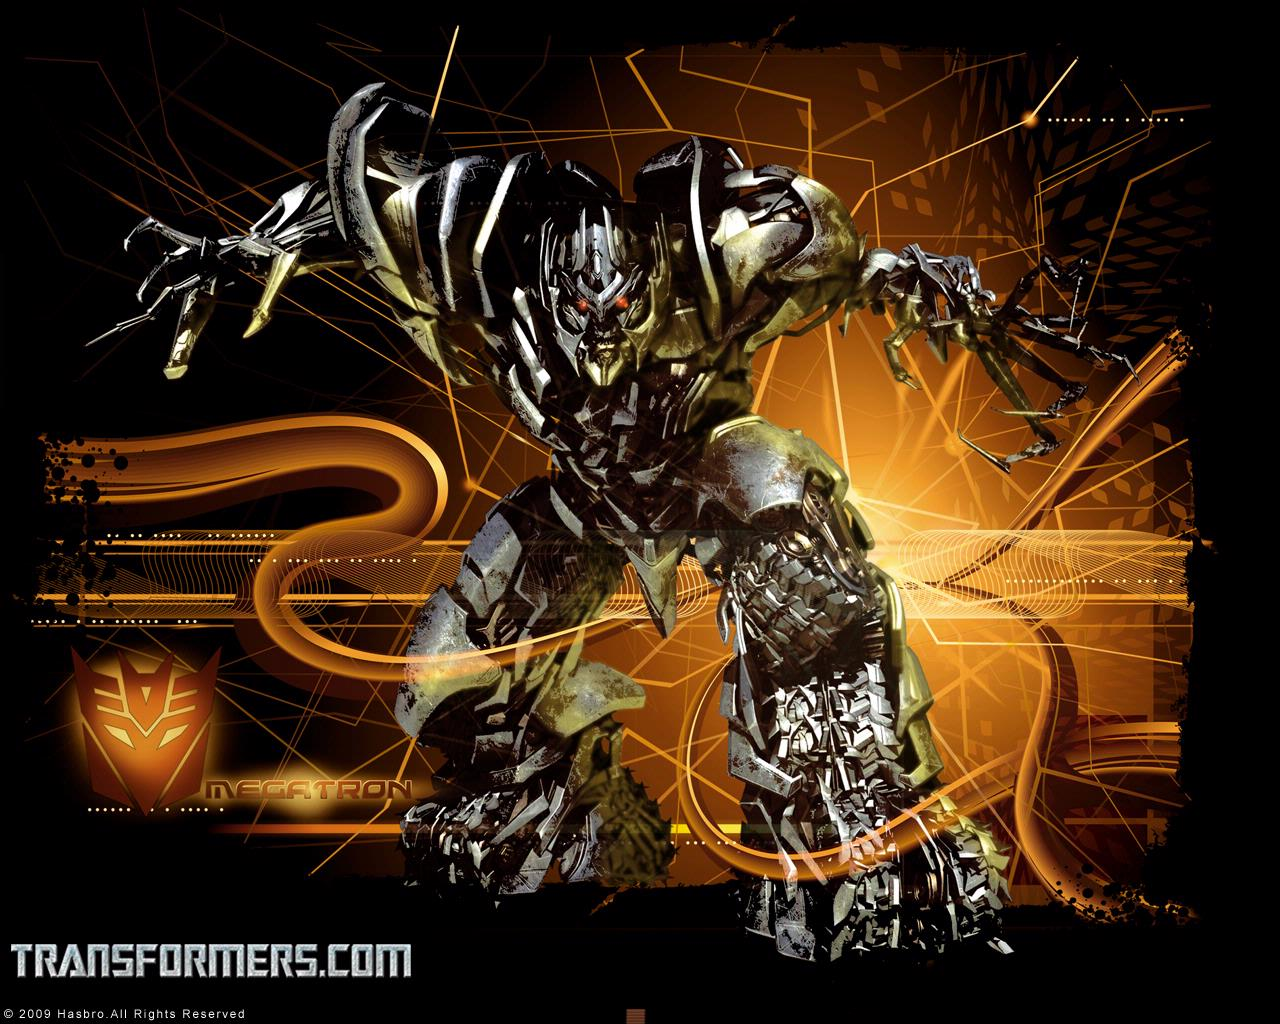 Transformers Wallpaper Download For Desktop 1280x1024